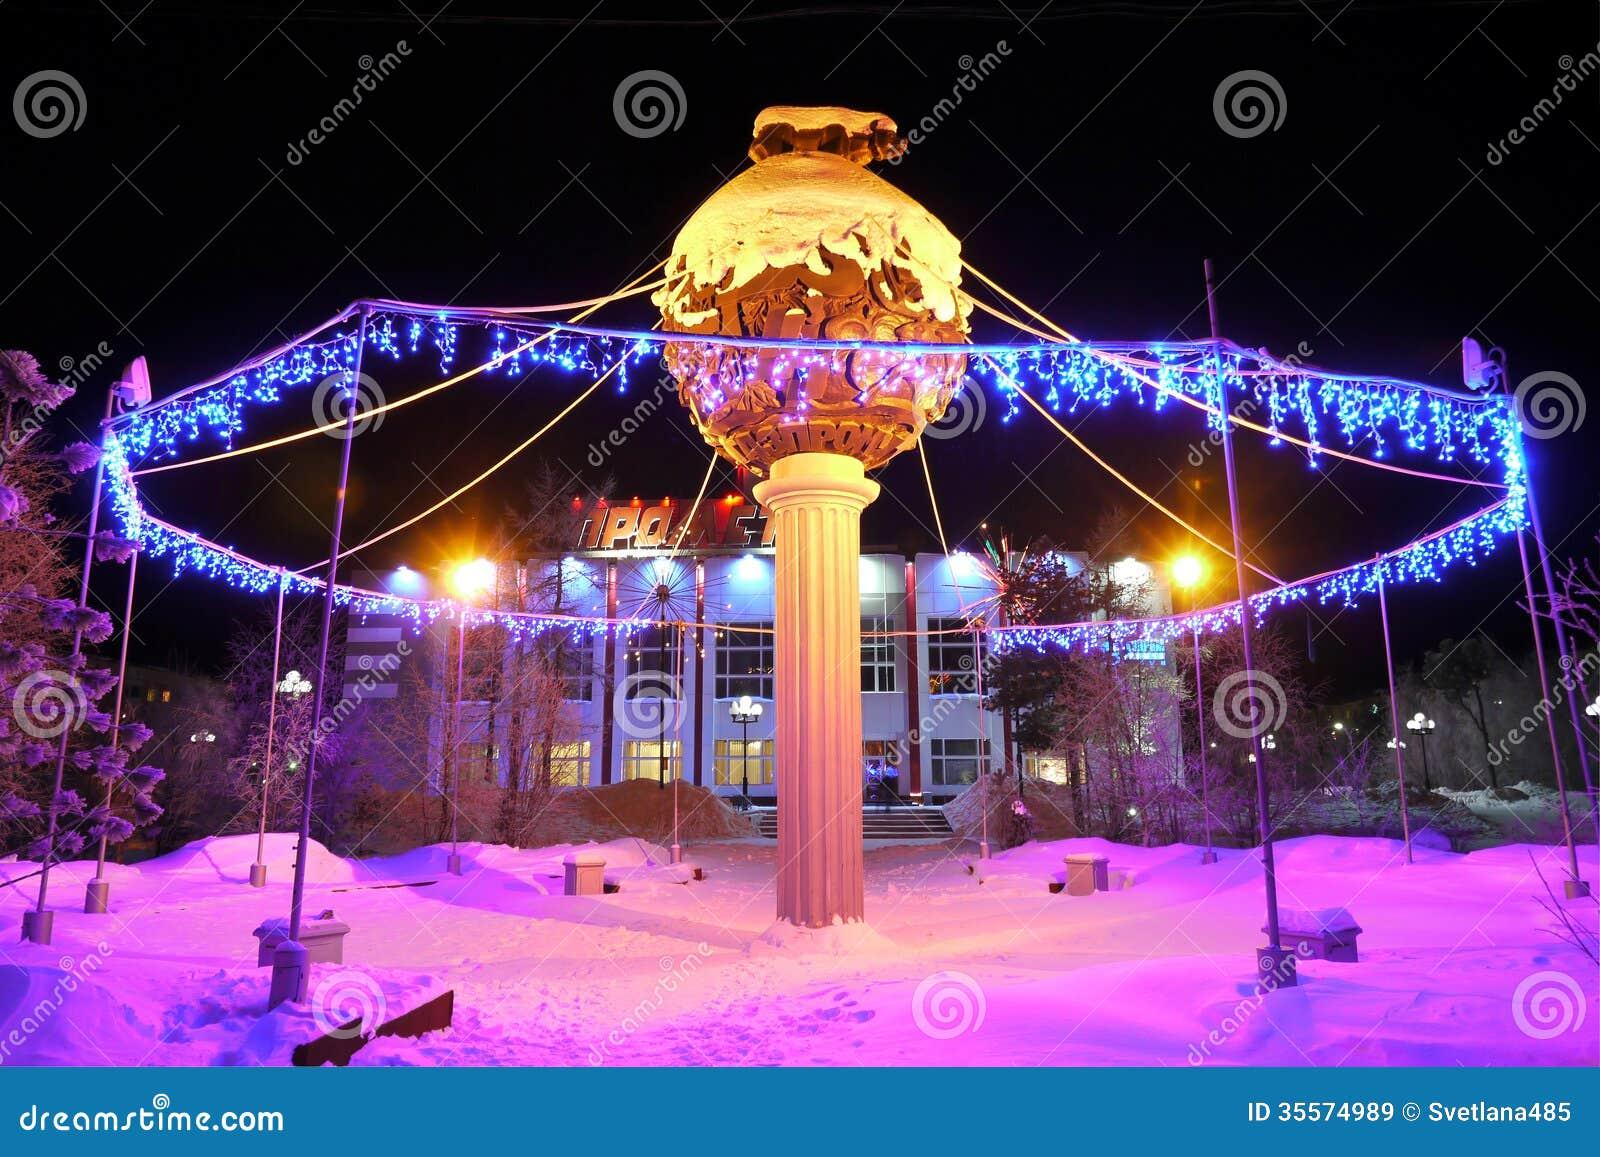 NADYM, RUSSIA - FEBRUARY 25, 2013: Christmas Decorations ...